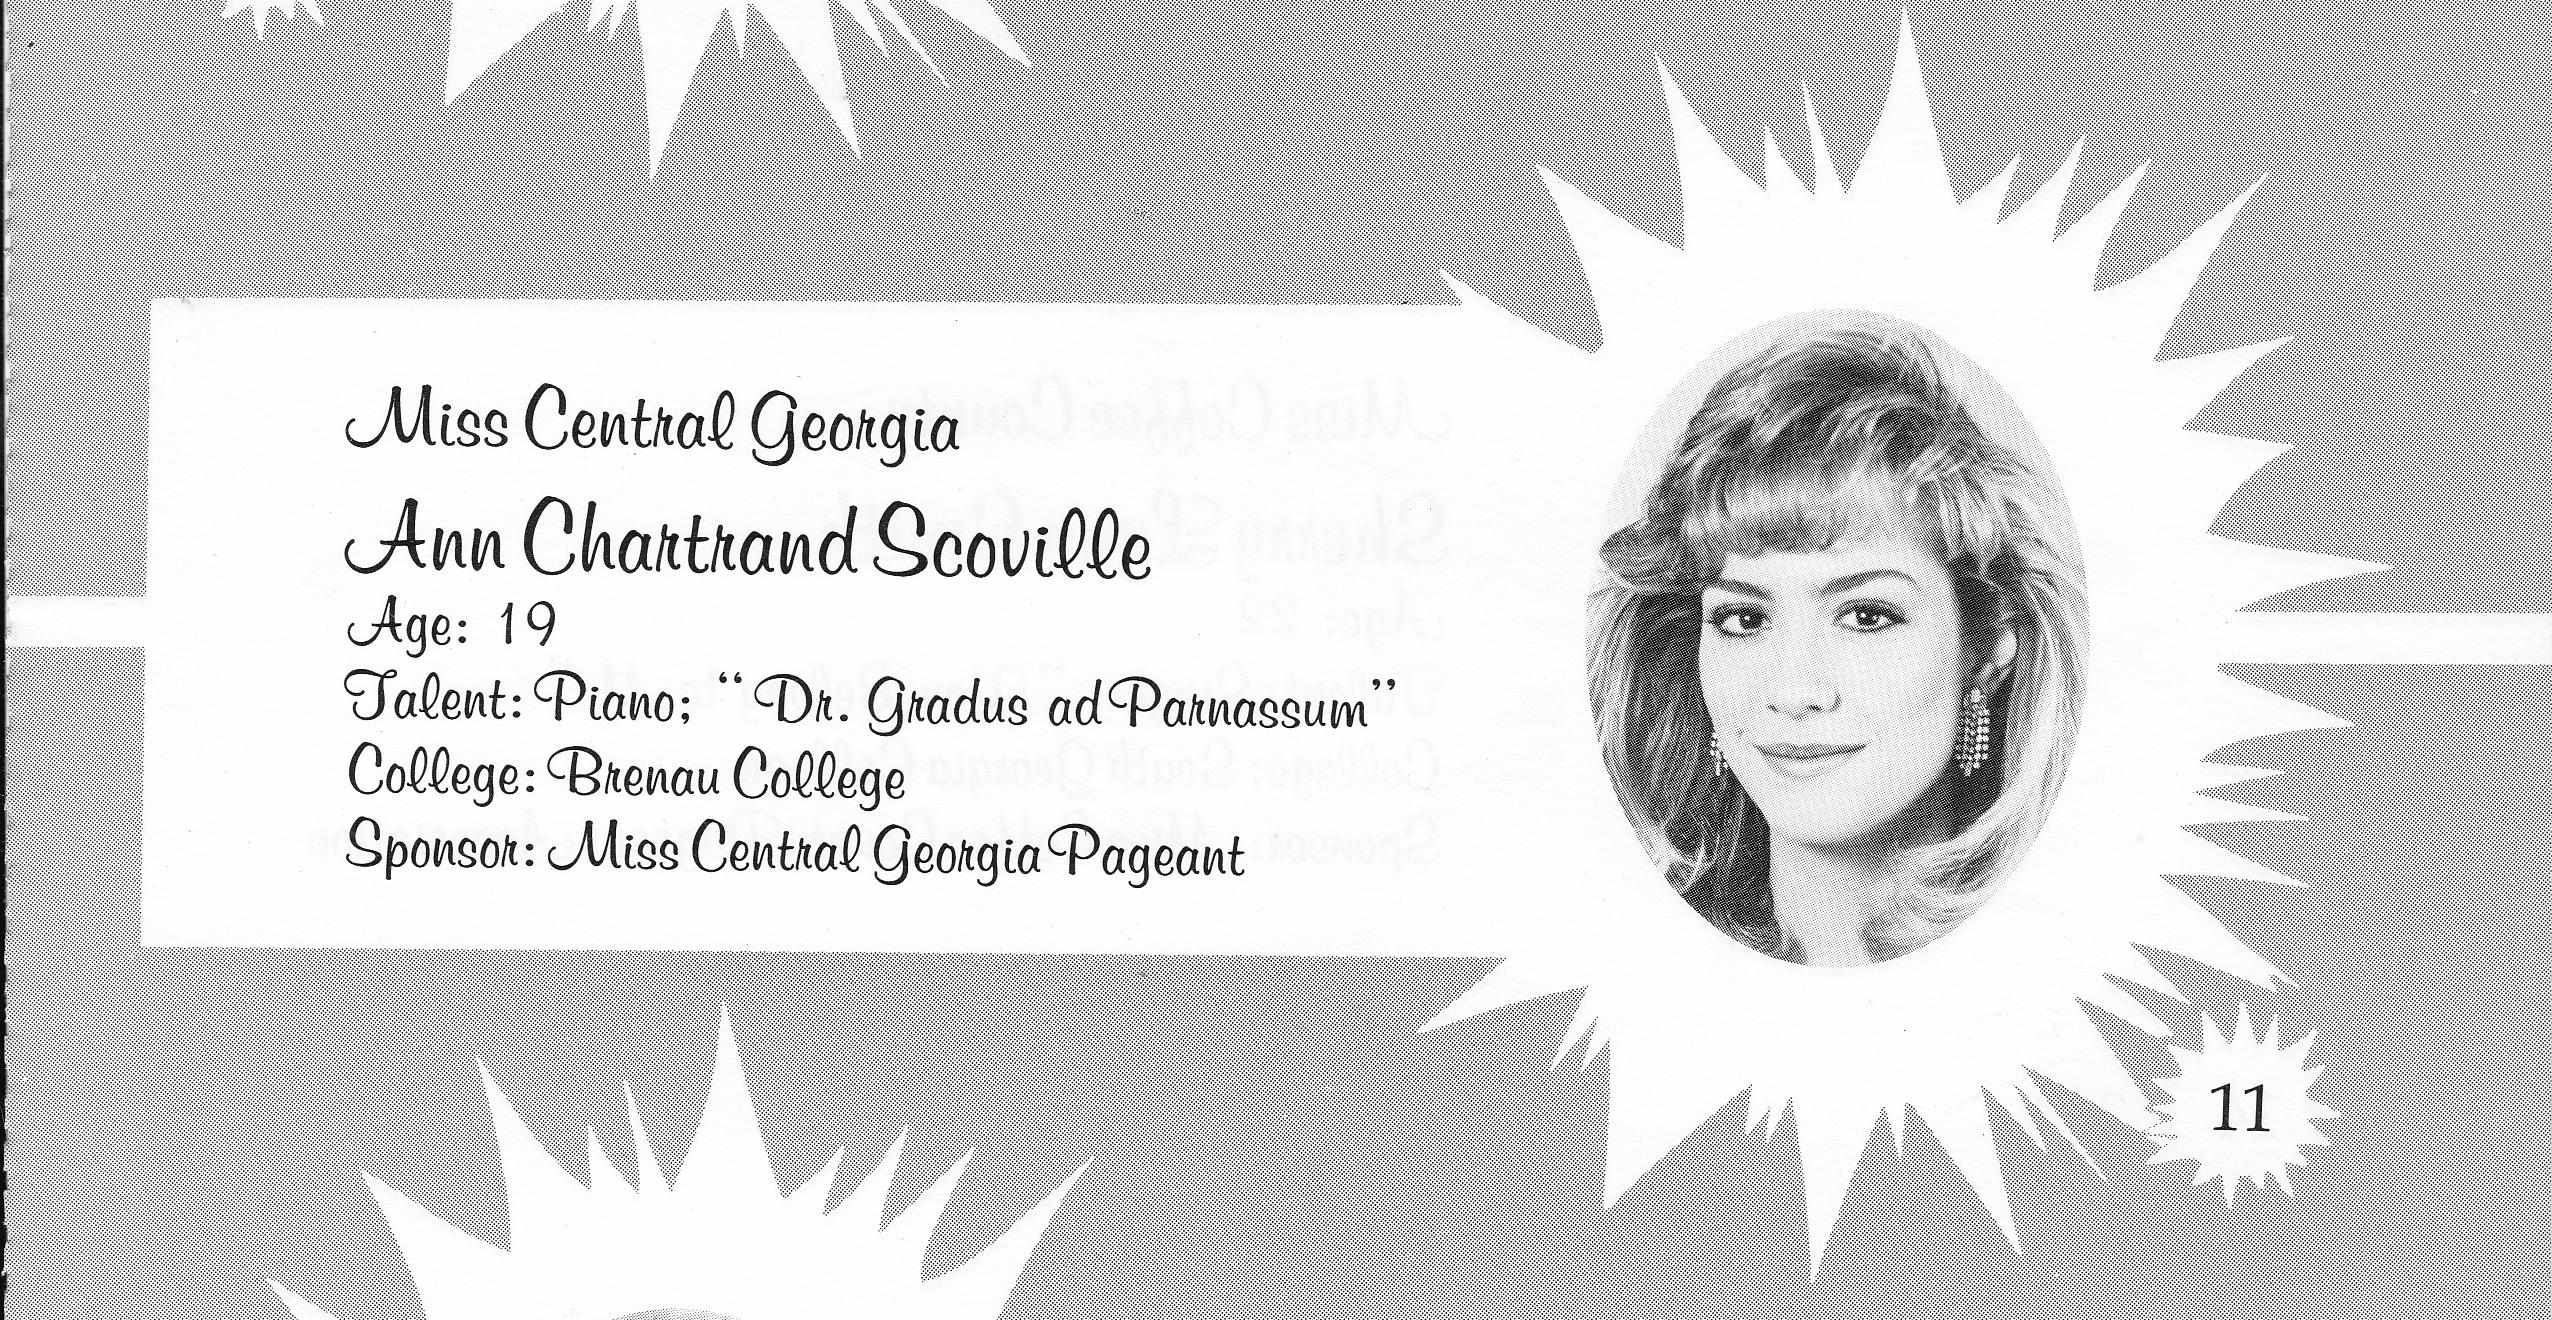 Miss Central Georgia